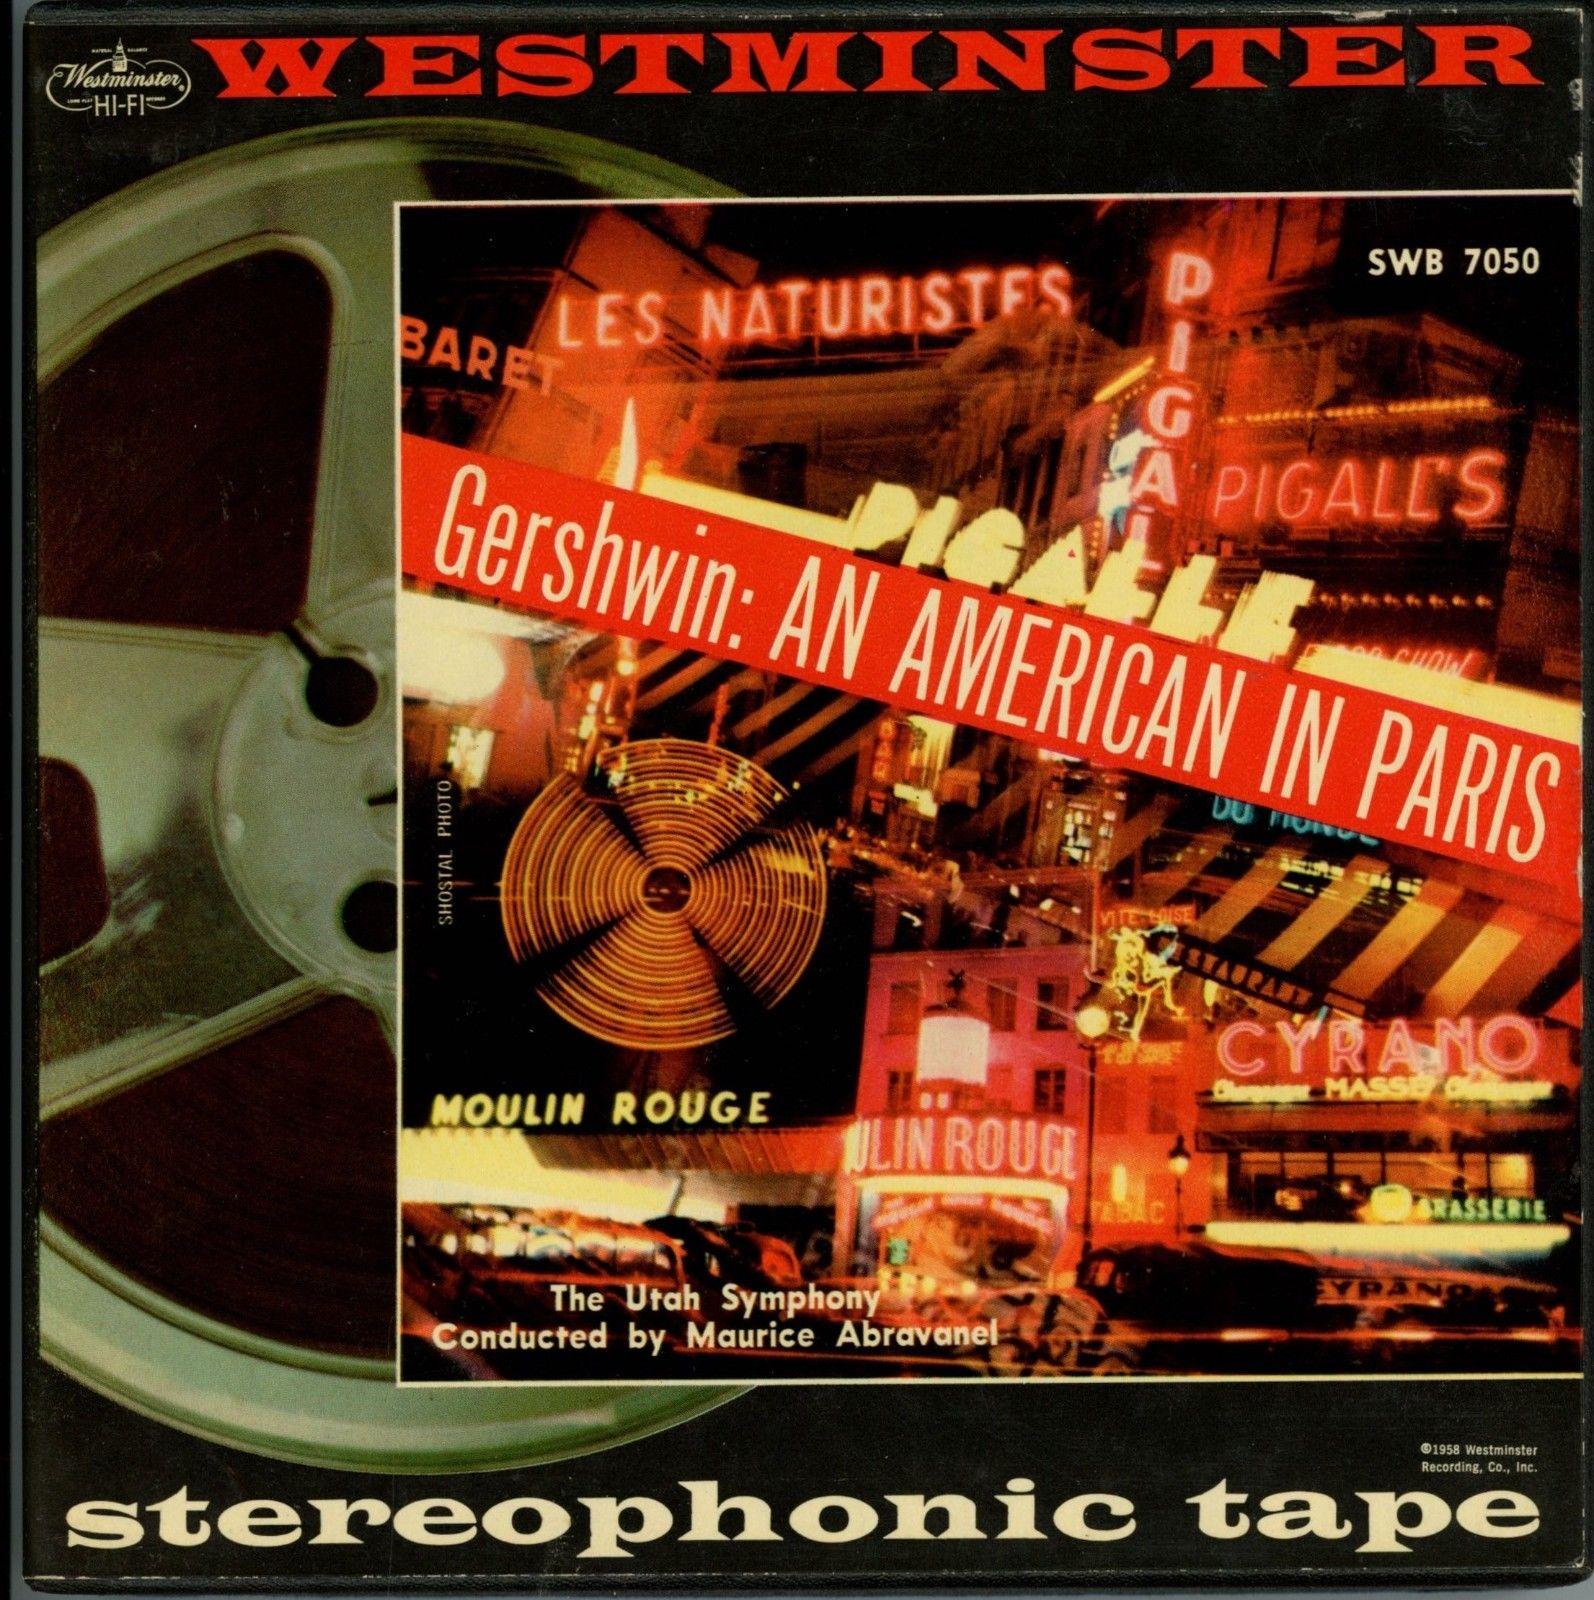 WESTMINSTER 2-TRACK TAPE SWB-7050: GERSHWIN - AN AMERICAN IN PARIS / ABRAVANEL